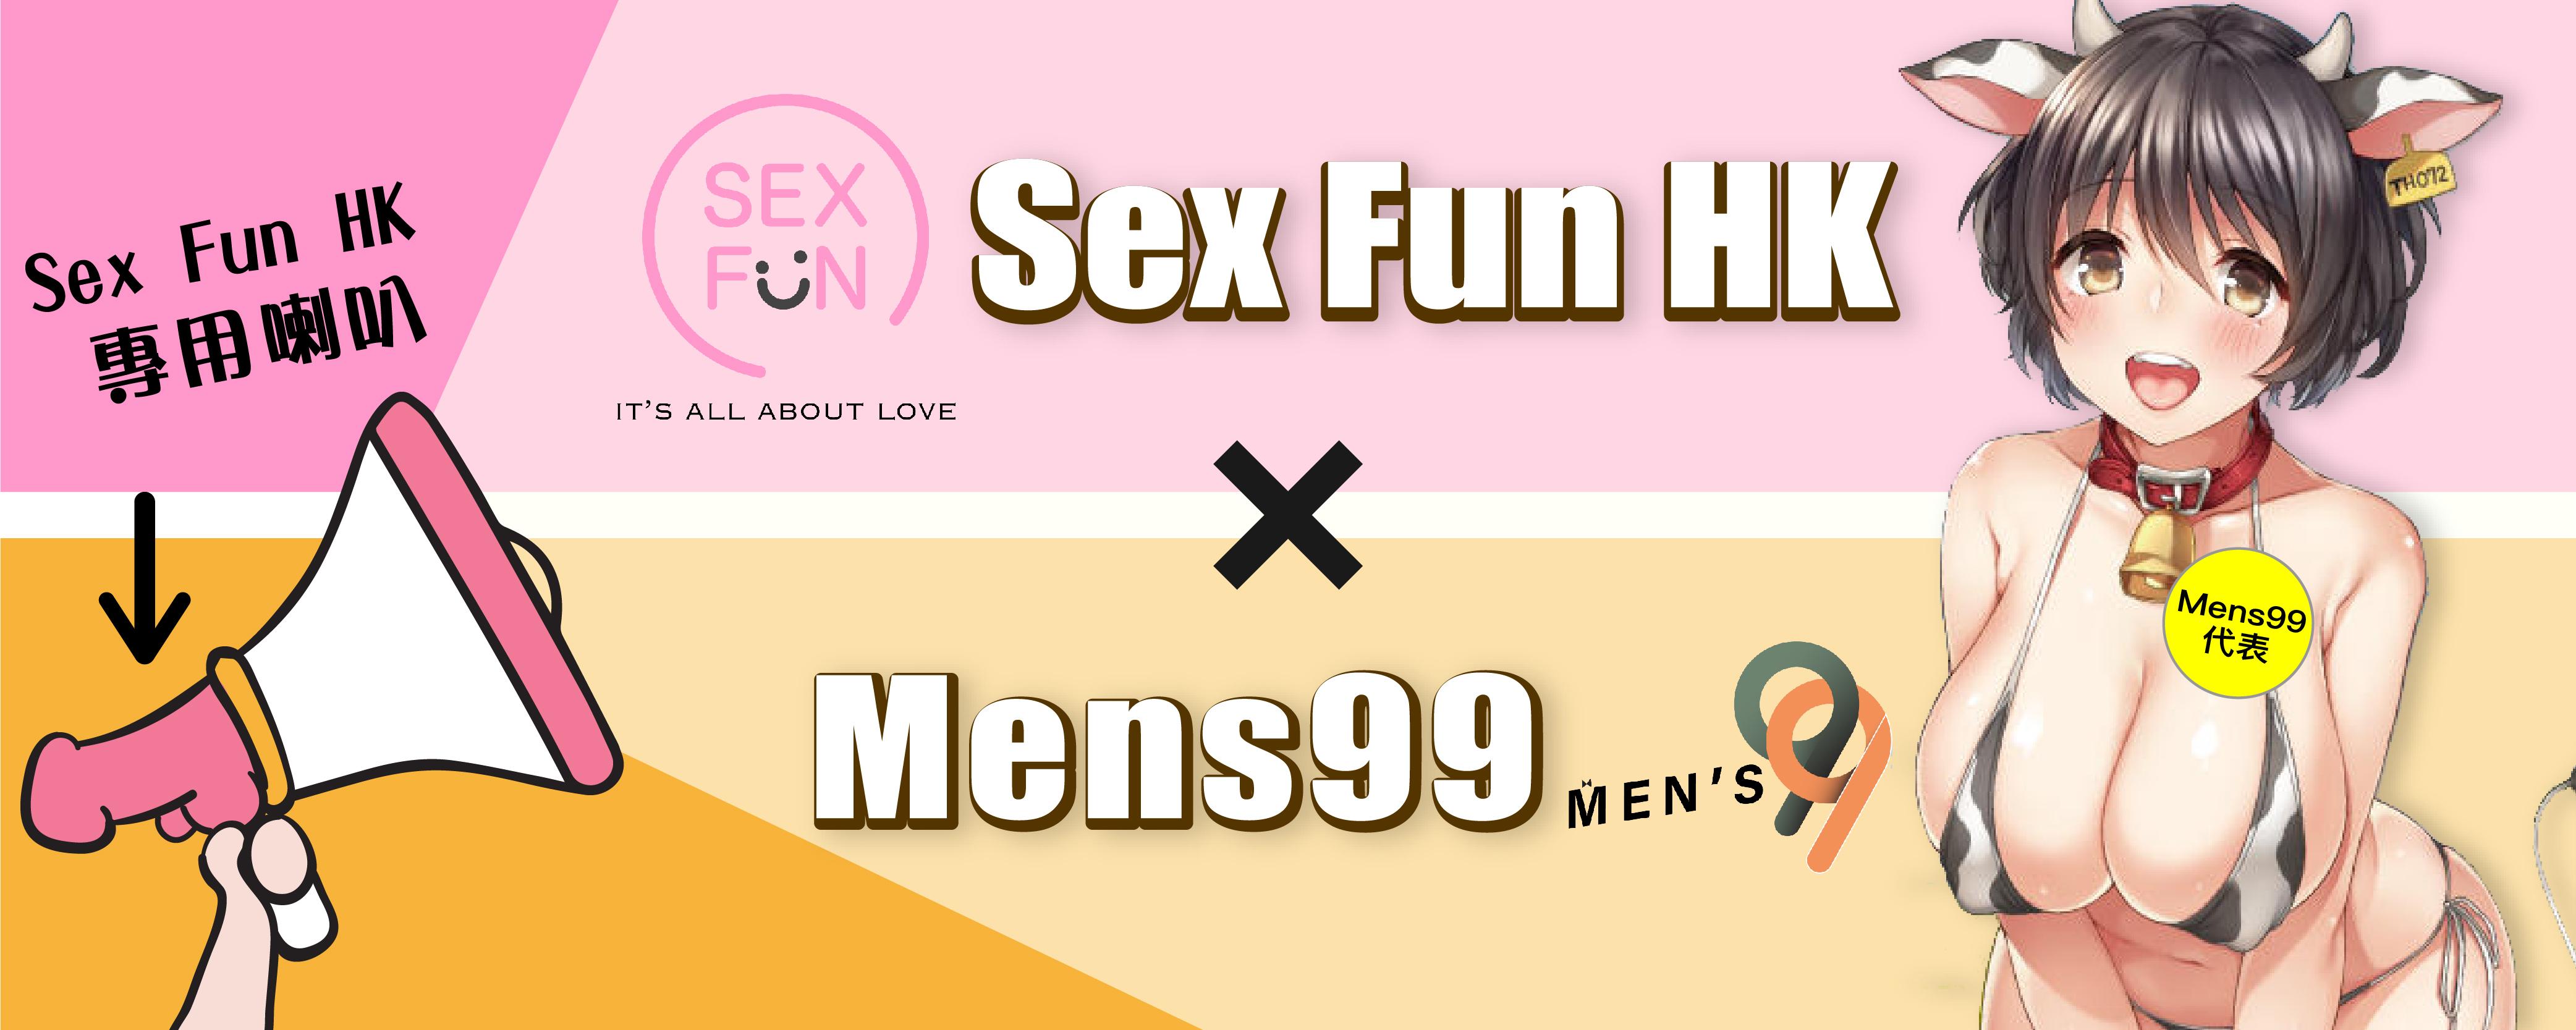 SexFunHK聯乘Mens99